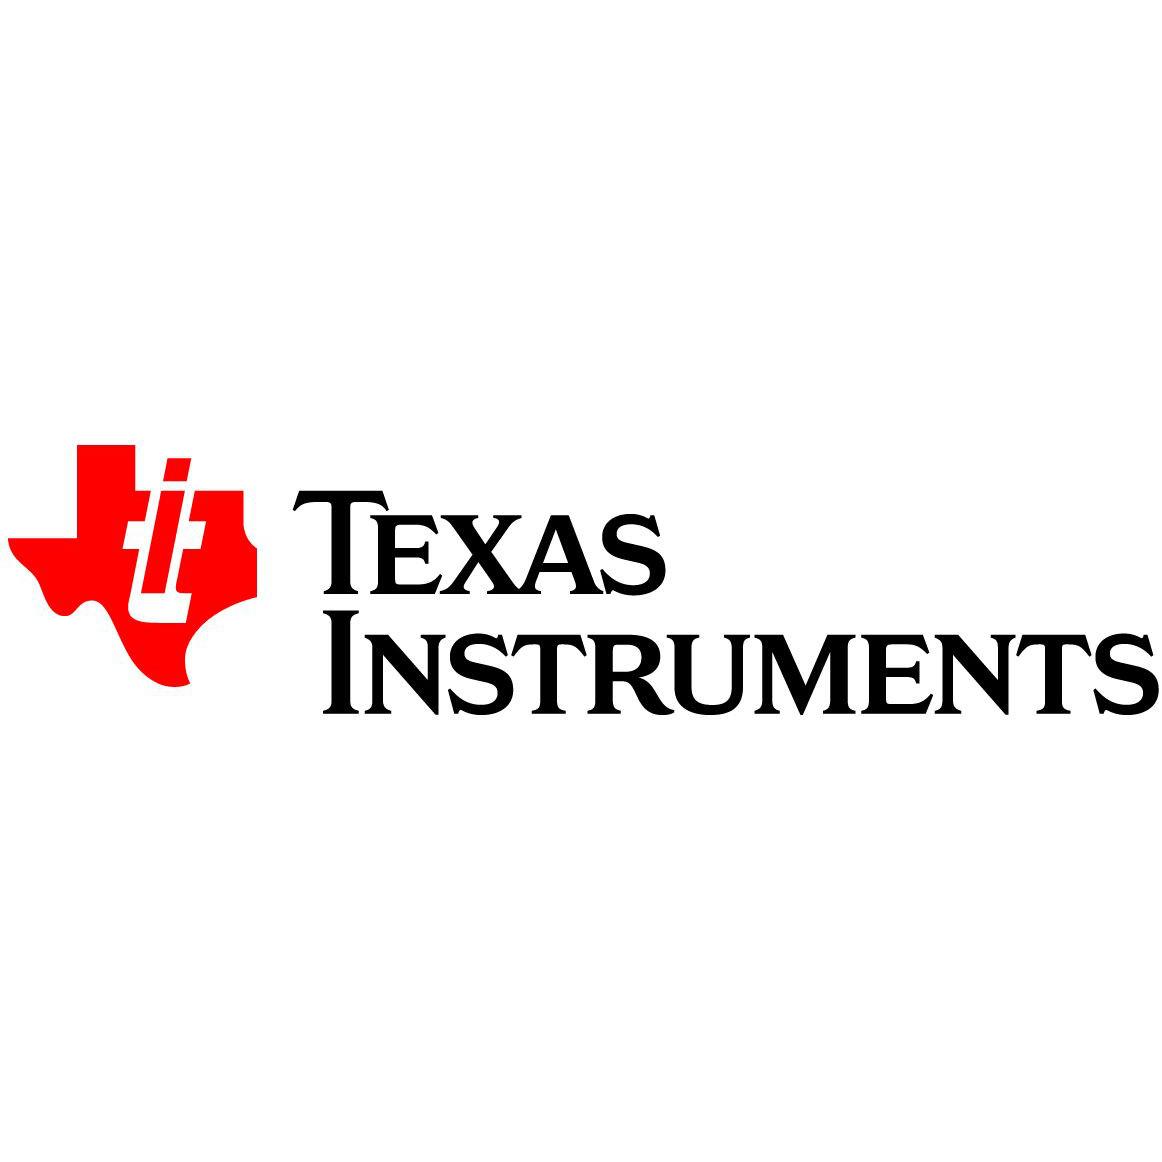 Texas-Instruments_oldrkenu